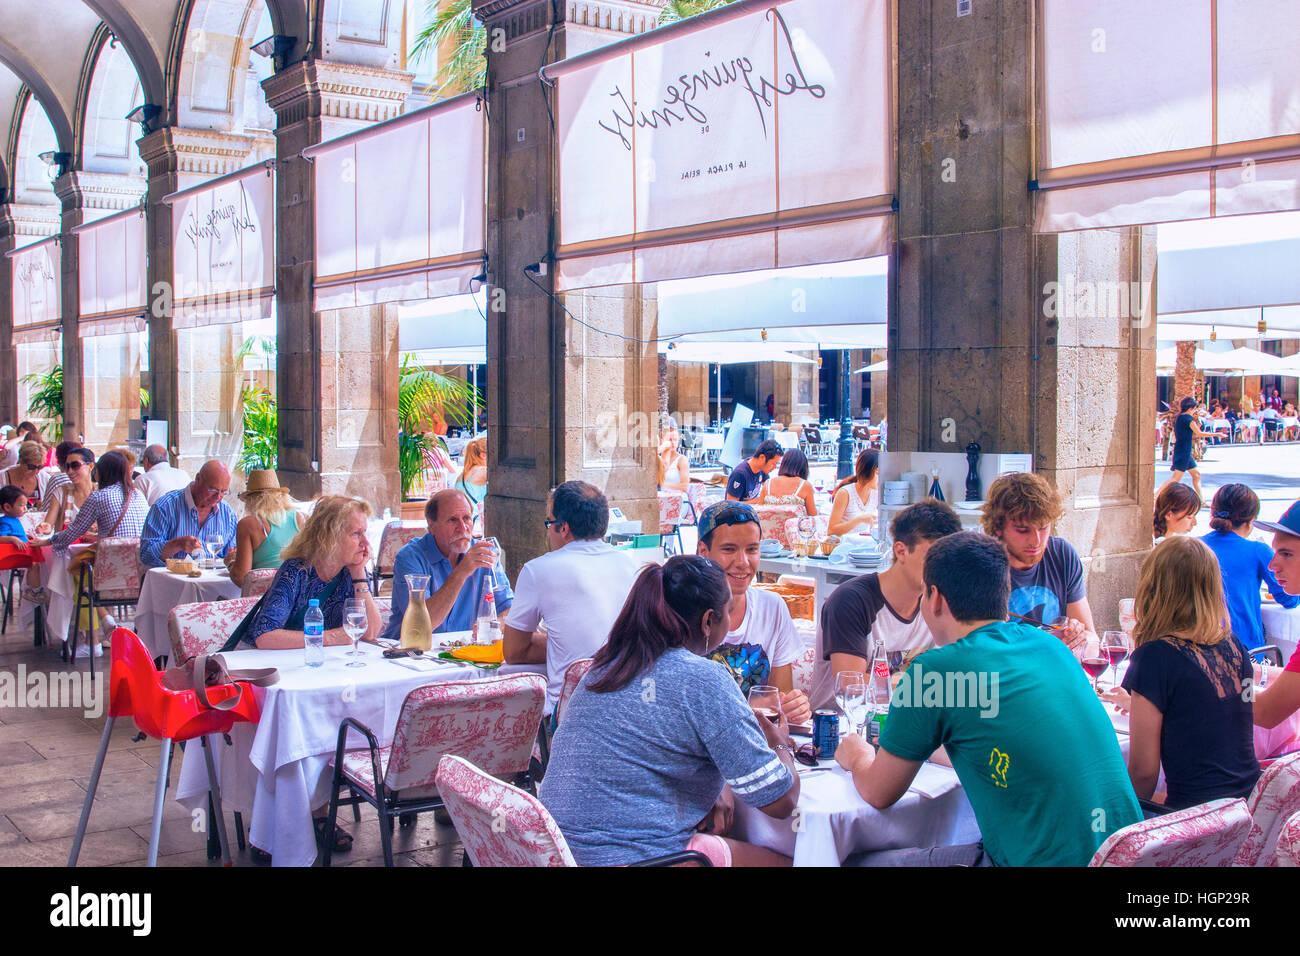 Plaza Real in Barcelona - Stock Image